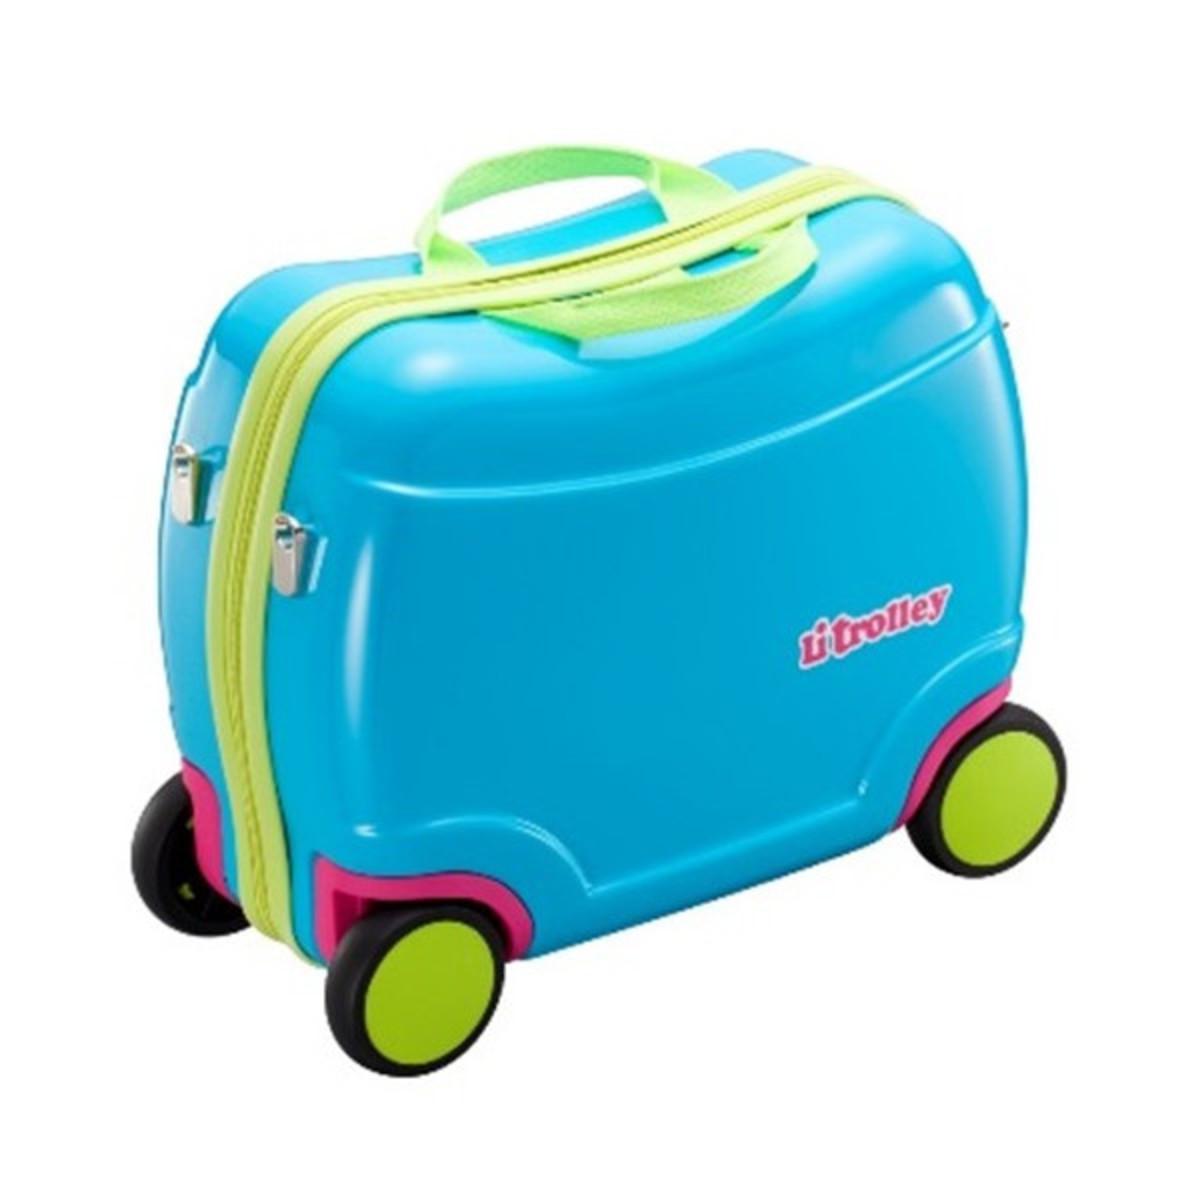 Multifunction kids luggage, Blue